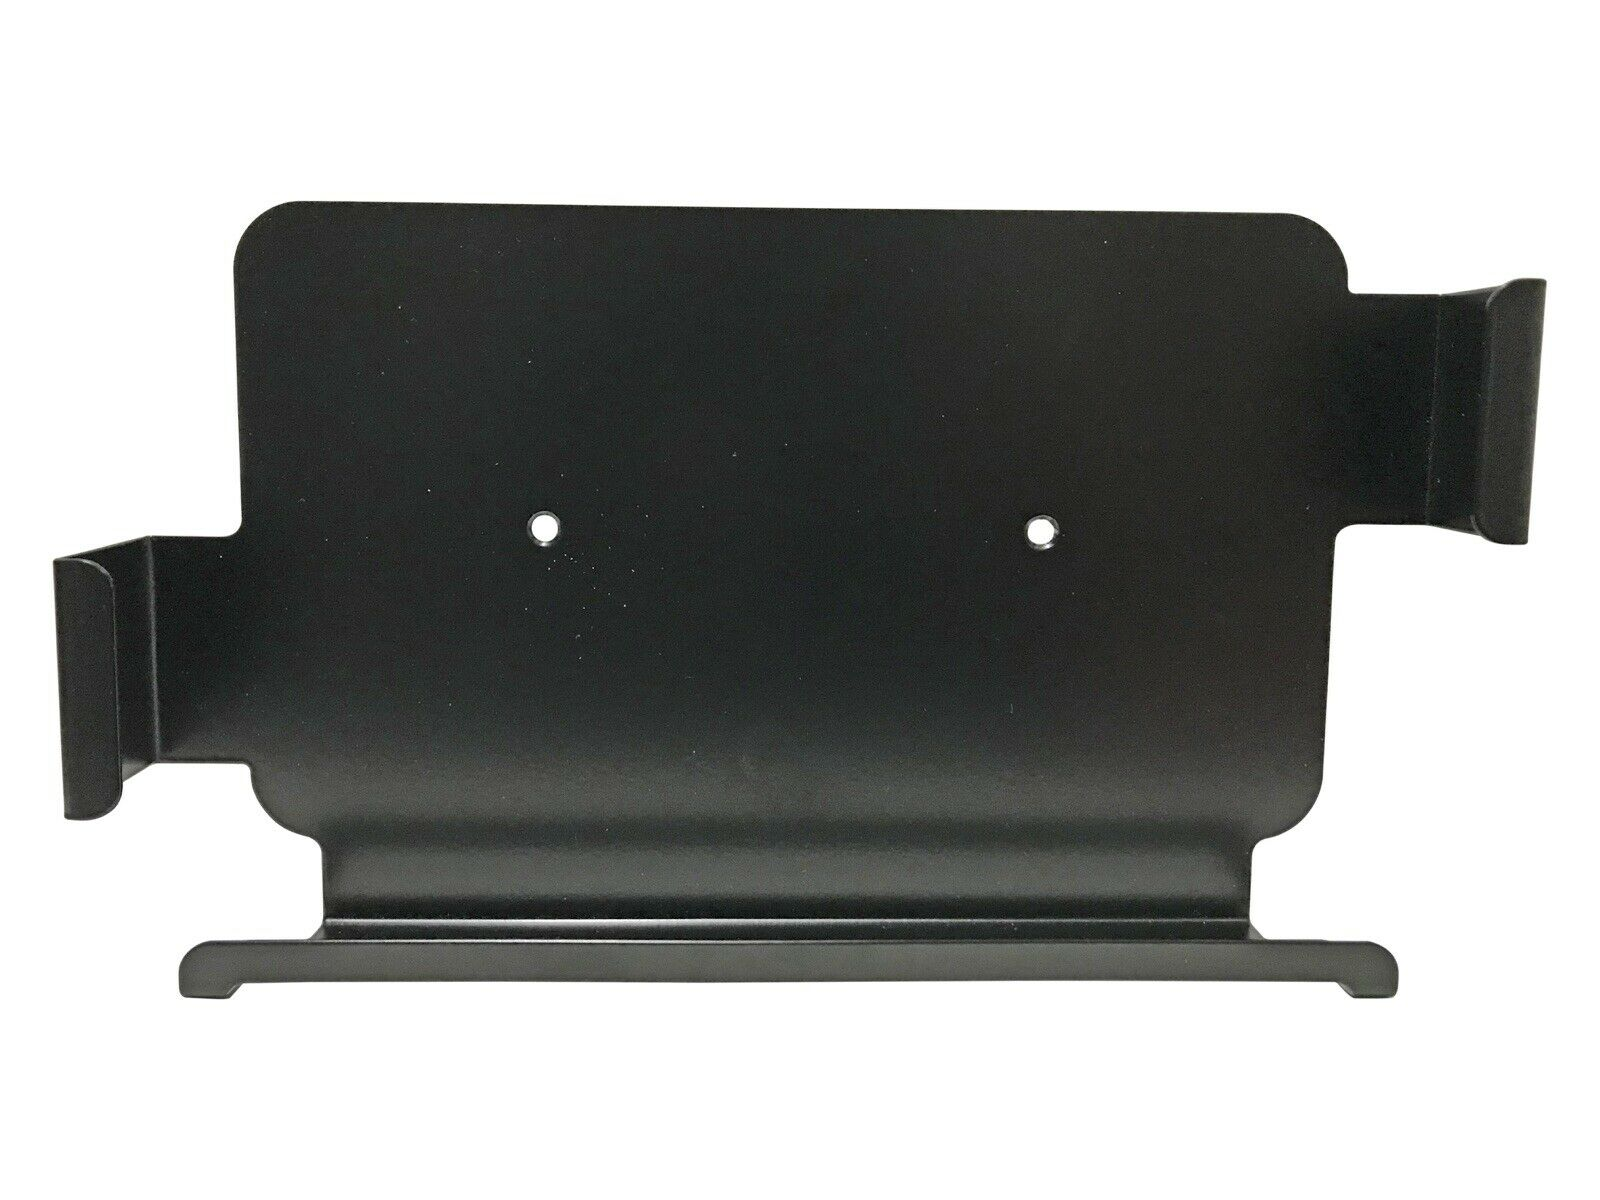 Easy Screwless Install by Inbrackets UK Made Sky Q Wall Mount Bracket For Sky Q 1TB BOX Sky Q 2TB Main box Black Steel Multi Directional